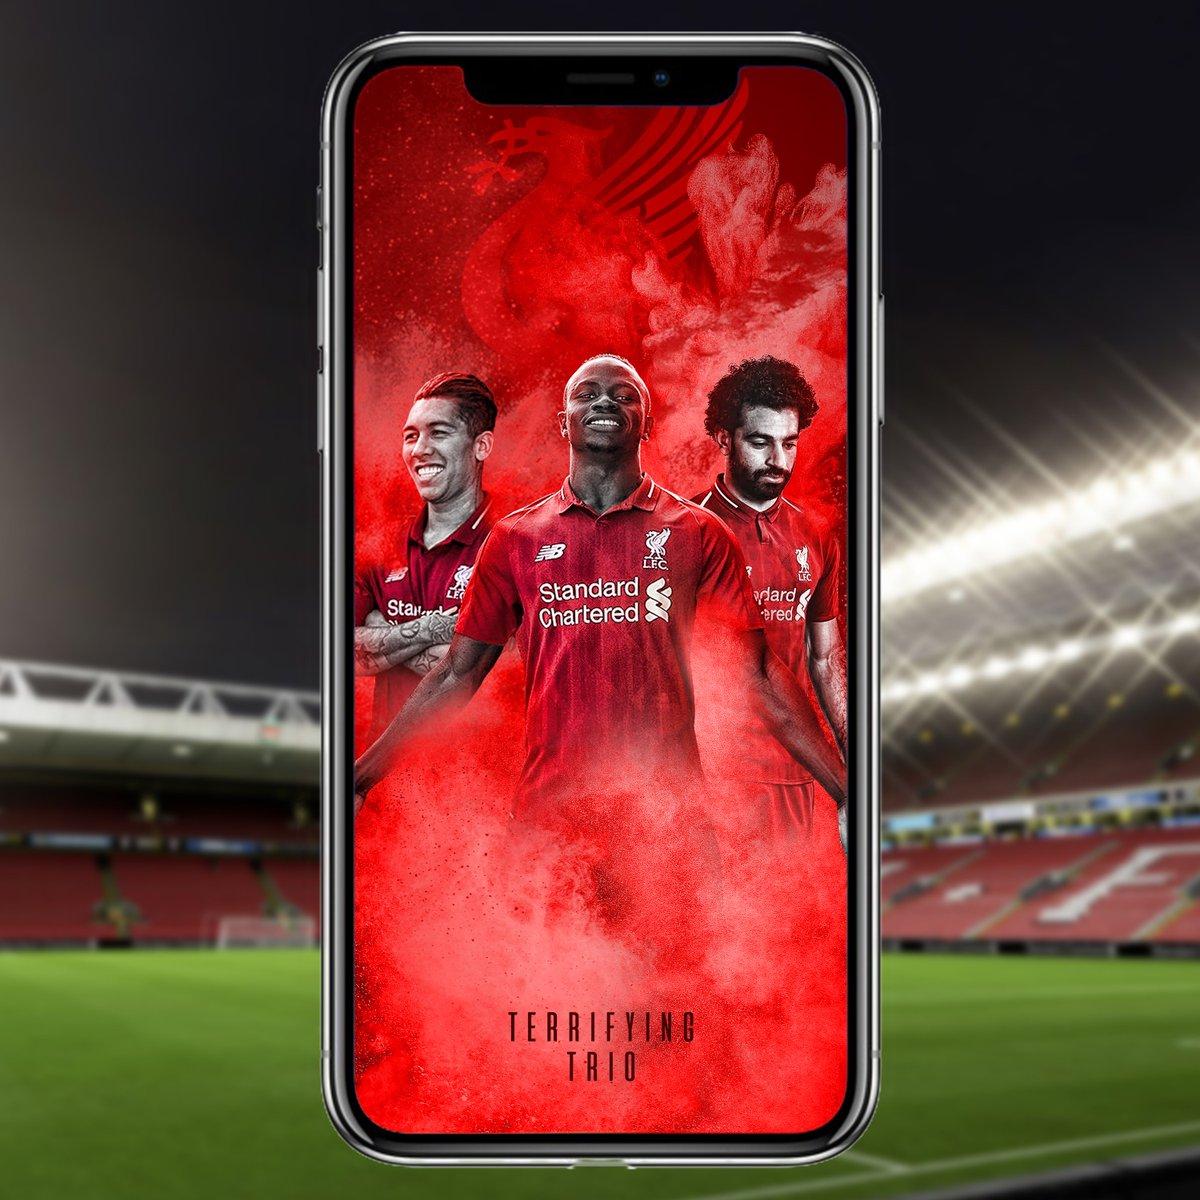 "GraphicSam On Twitter: ""#LiverpoolFC Strikeforce Phone"